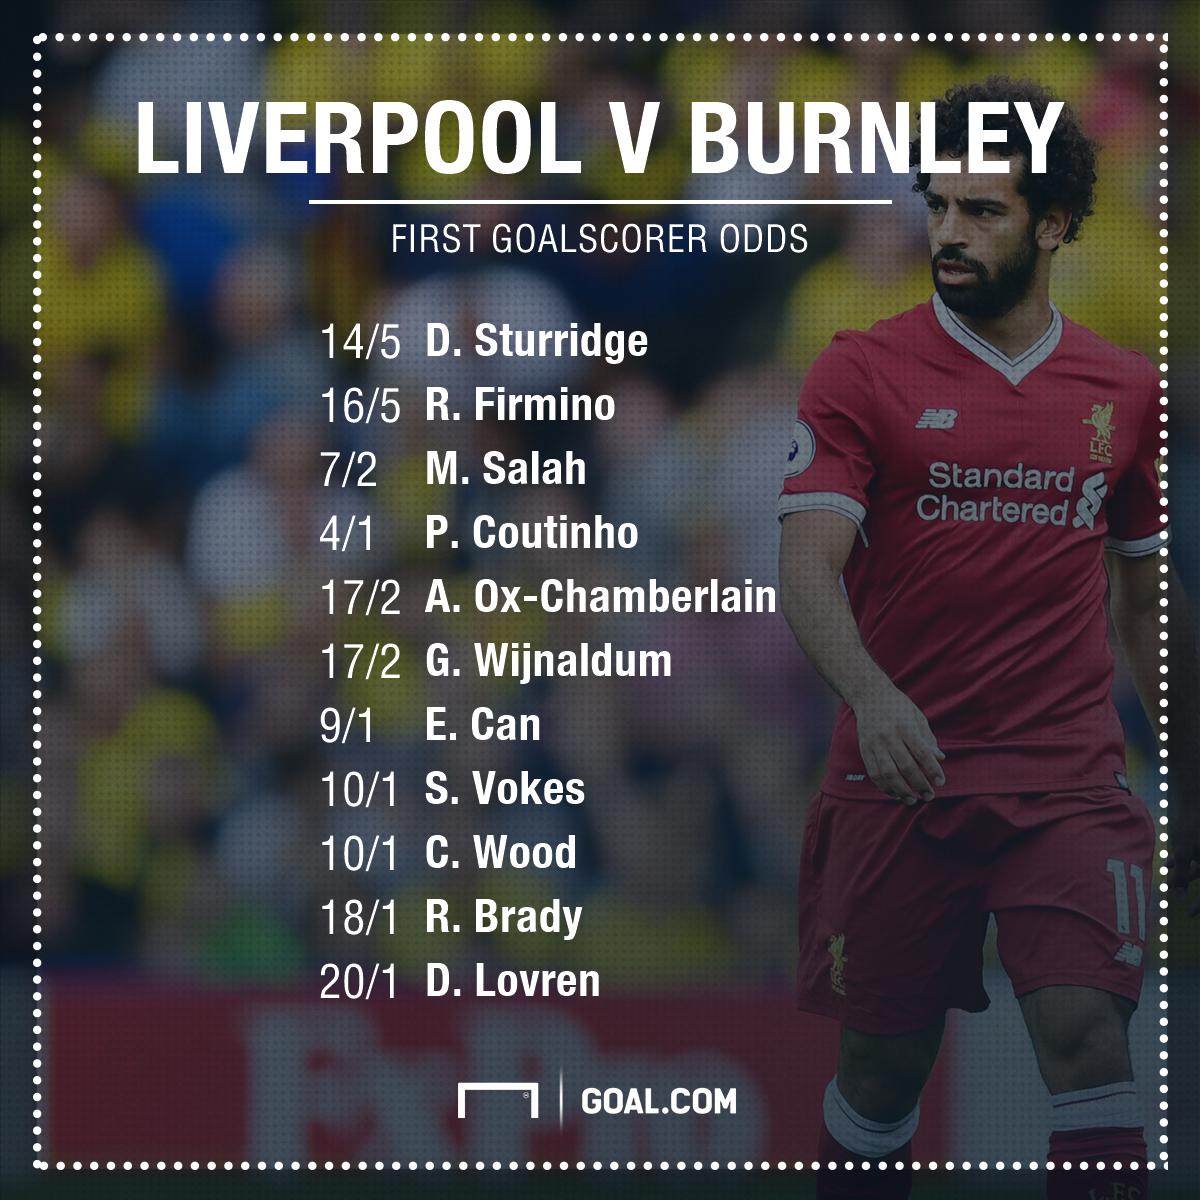 Liverpool v Burnley